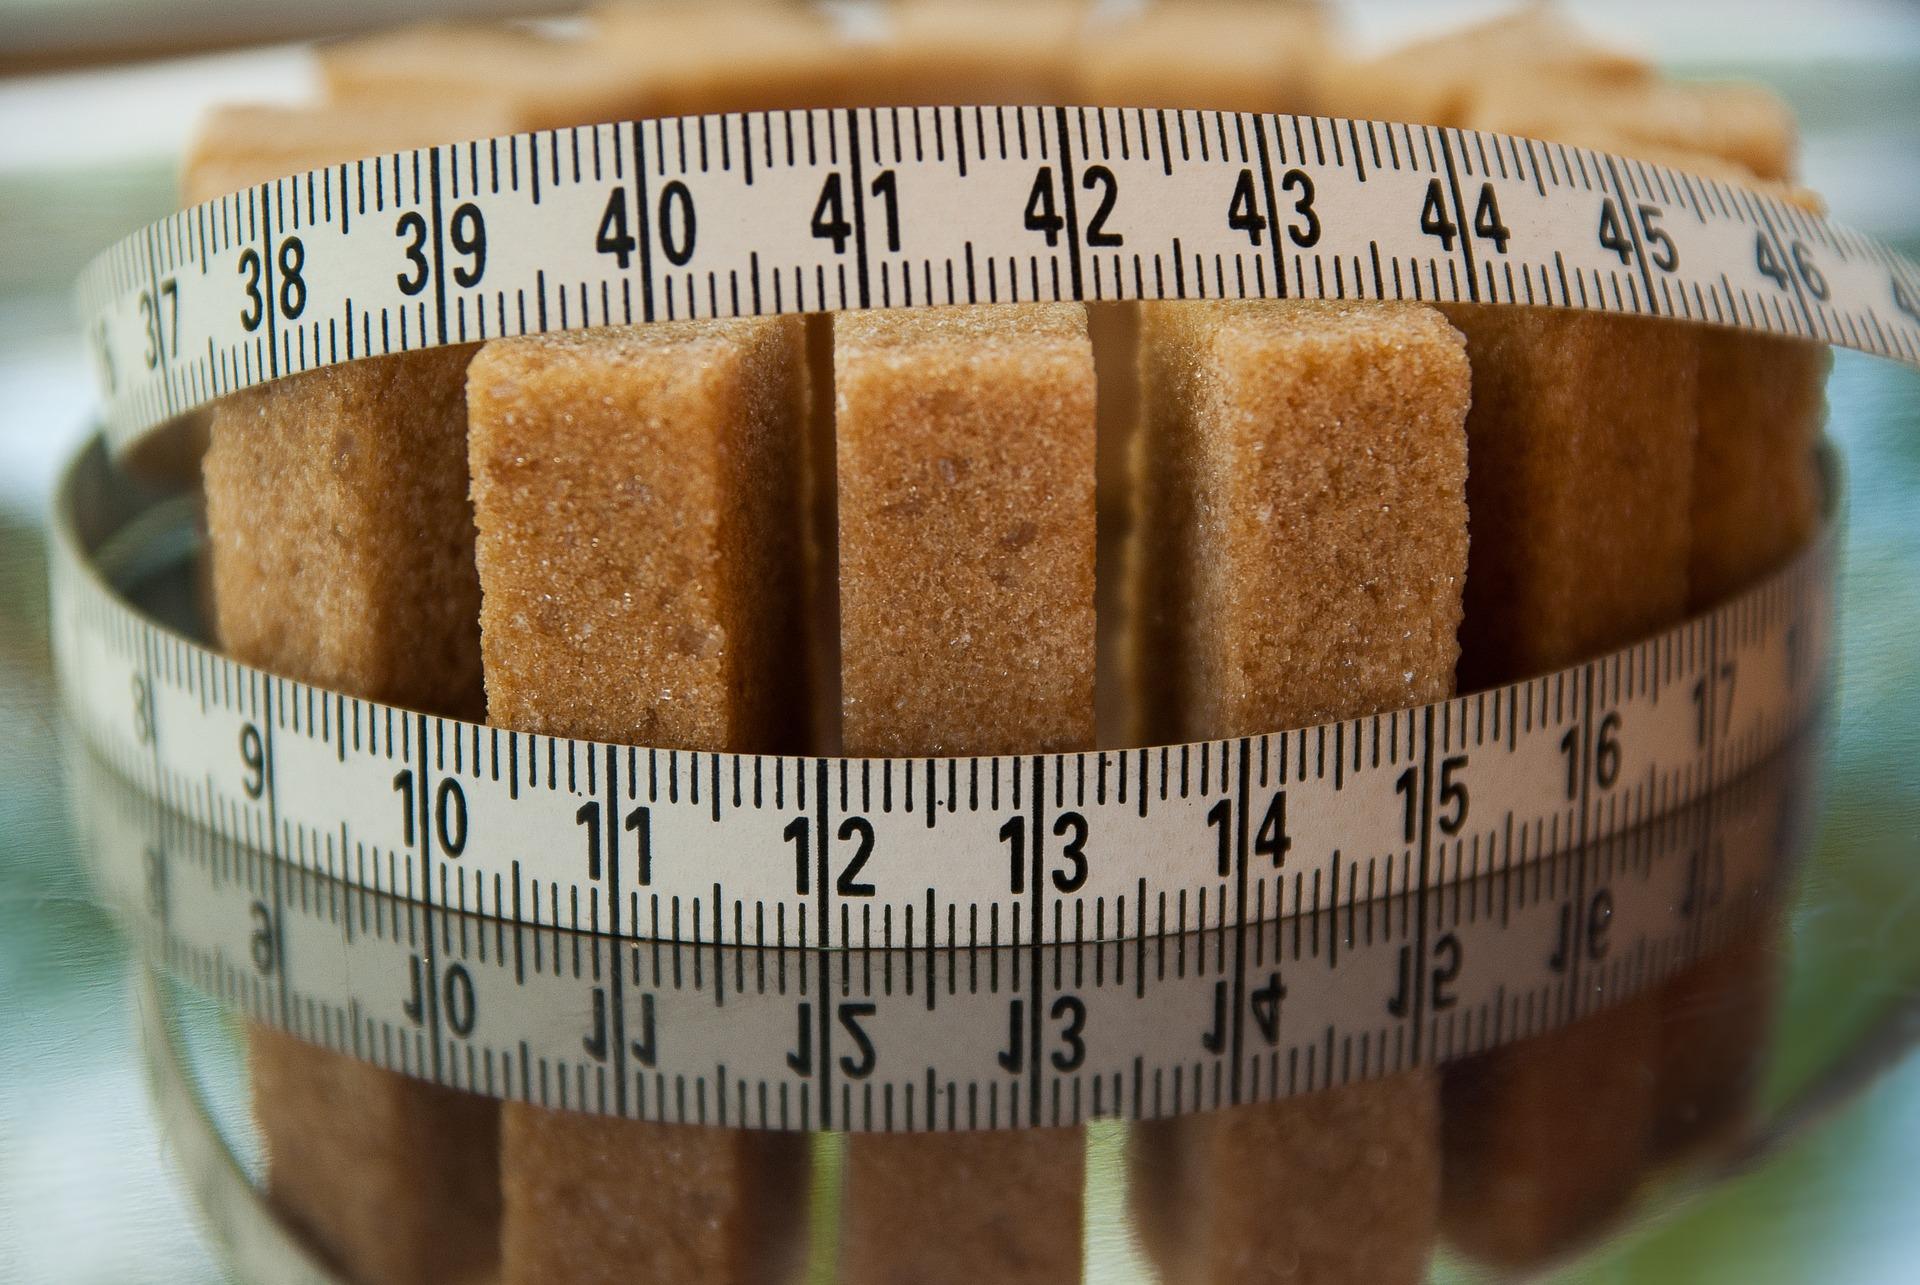 Sugar consumption in decline